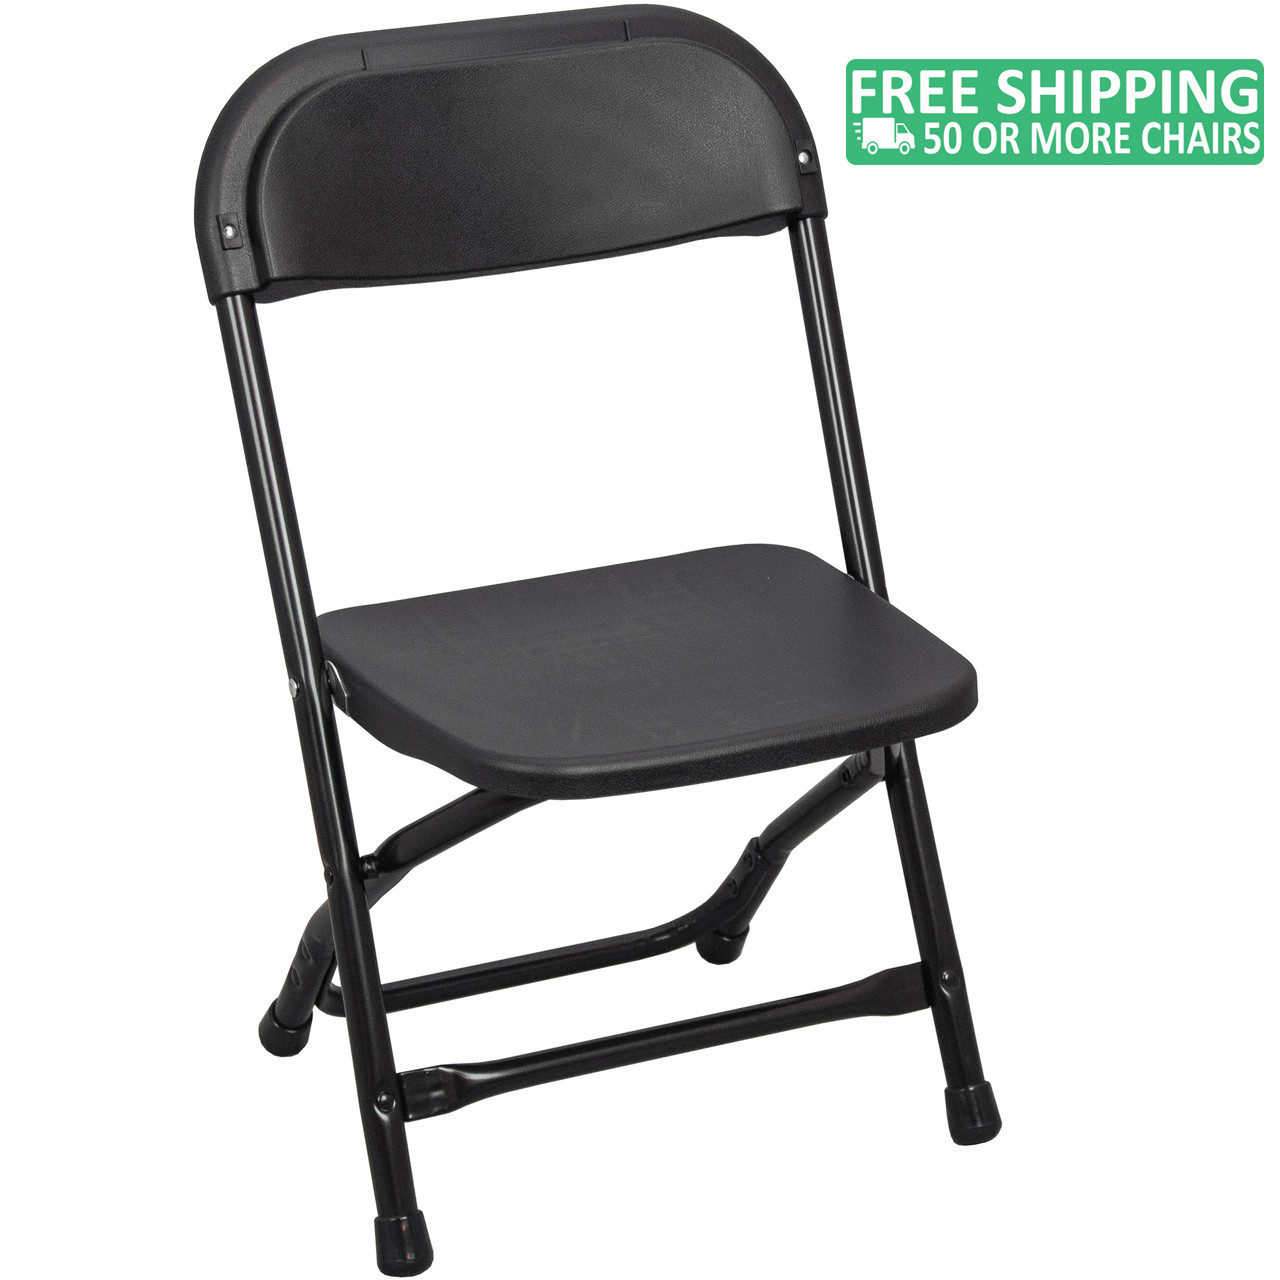 Kids Folding Chairs Black Plastic Foldable Chairs